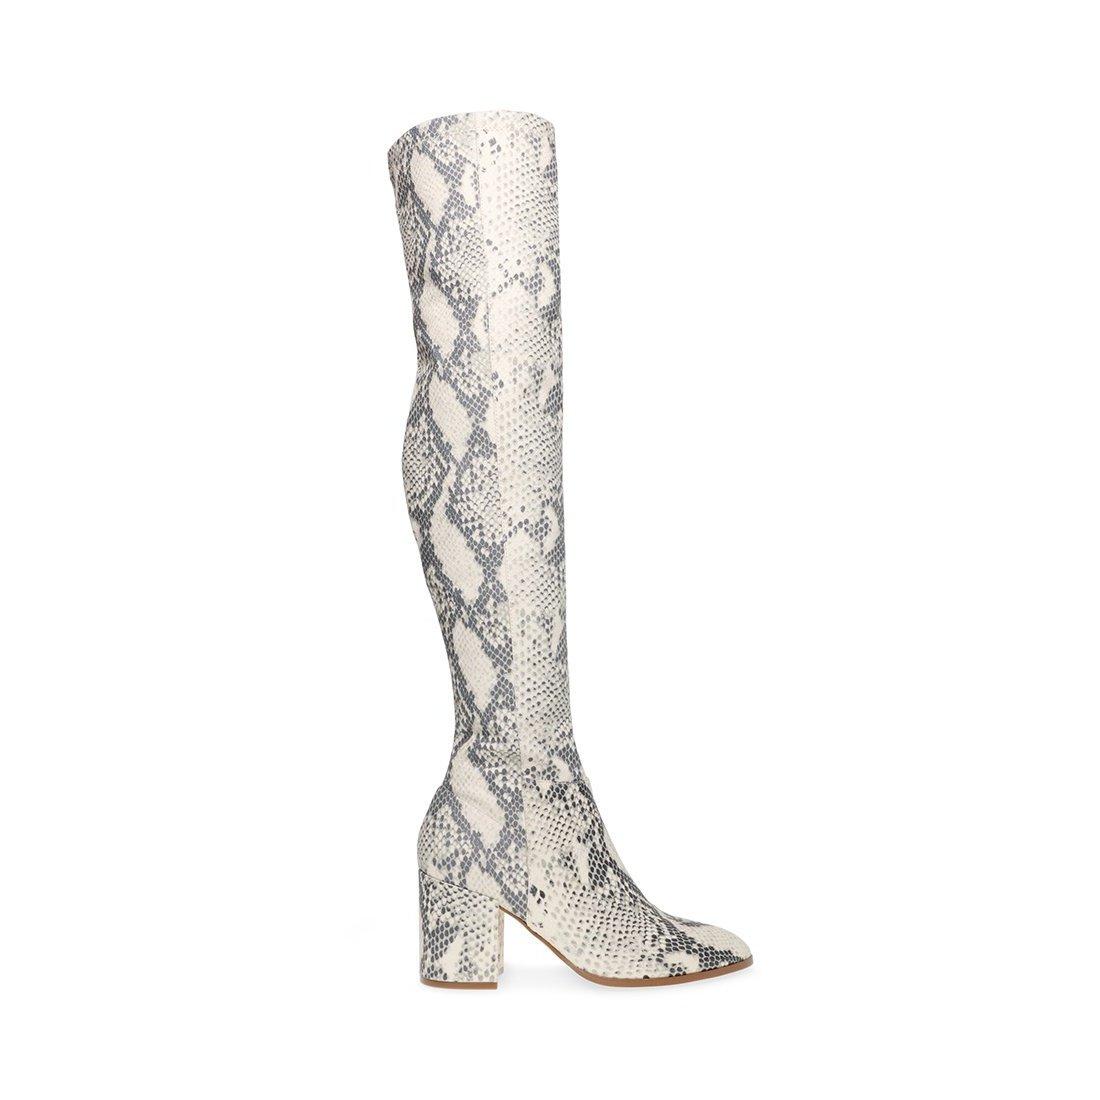 Steve Madden Jacey Natural Snake Boots